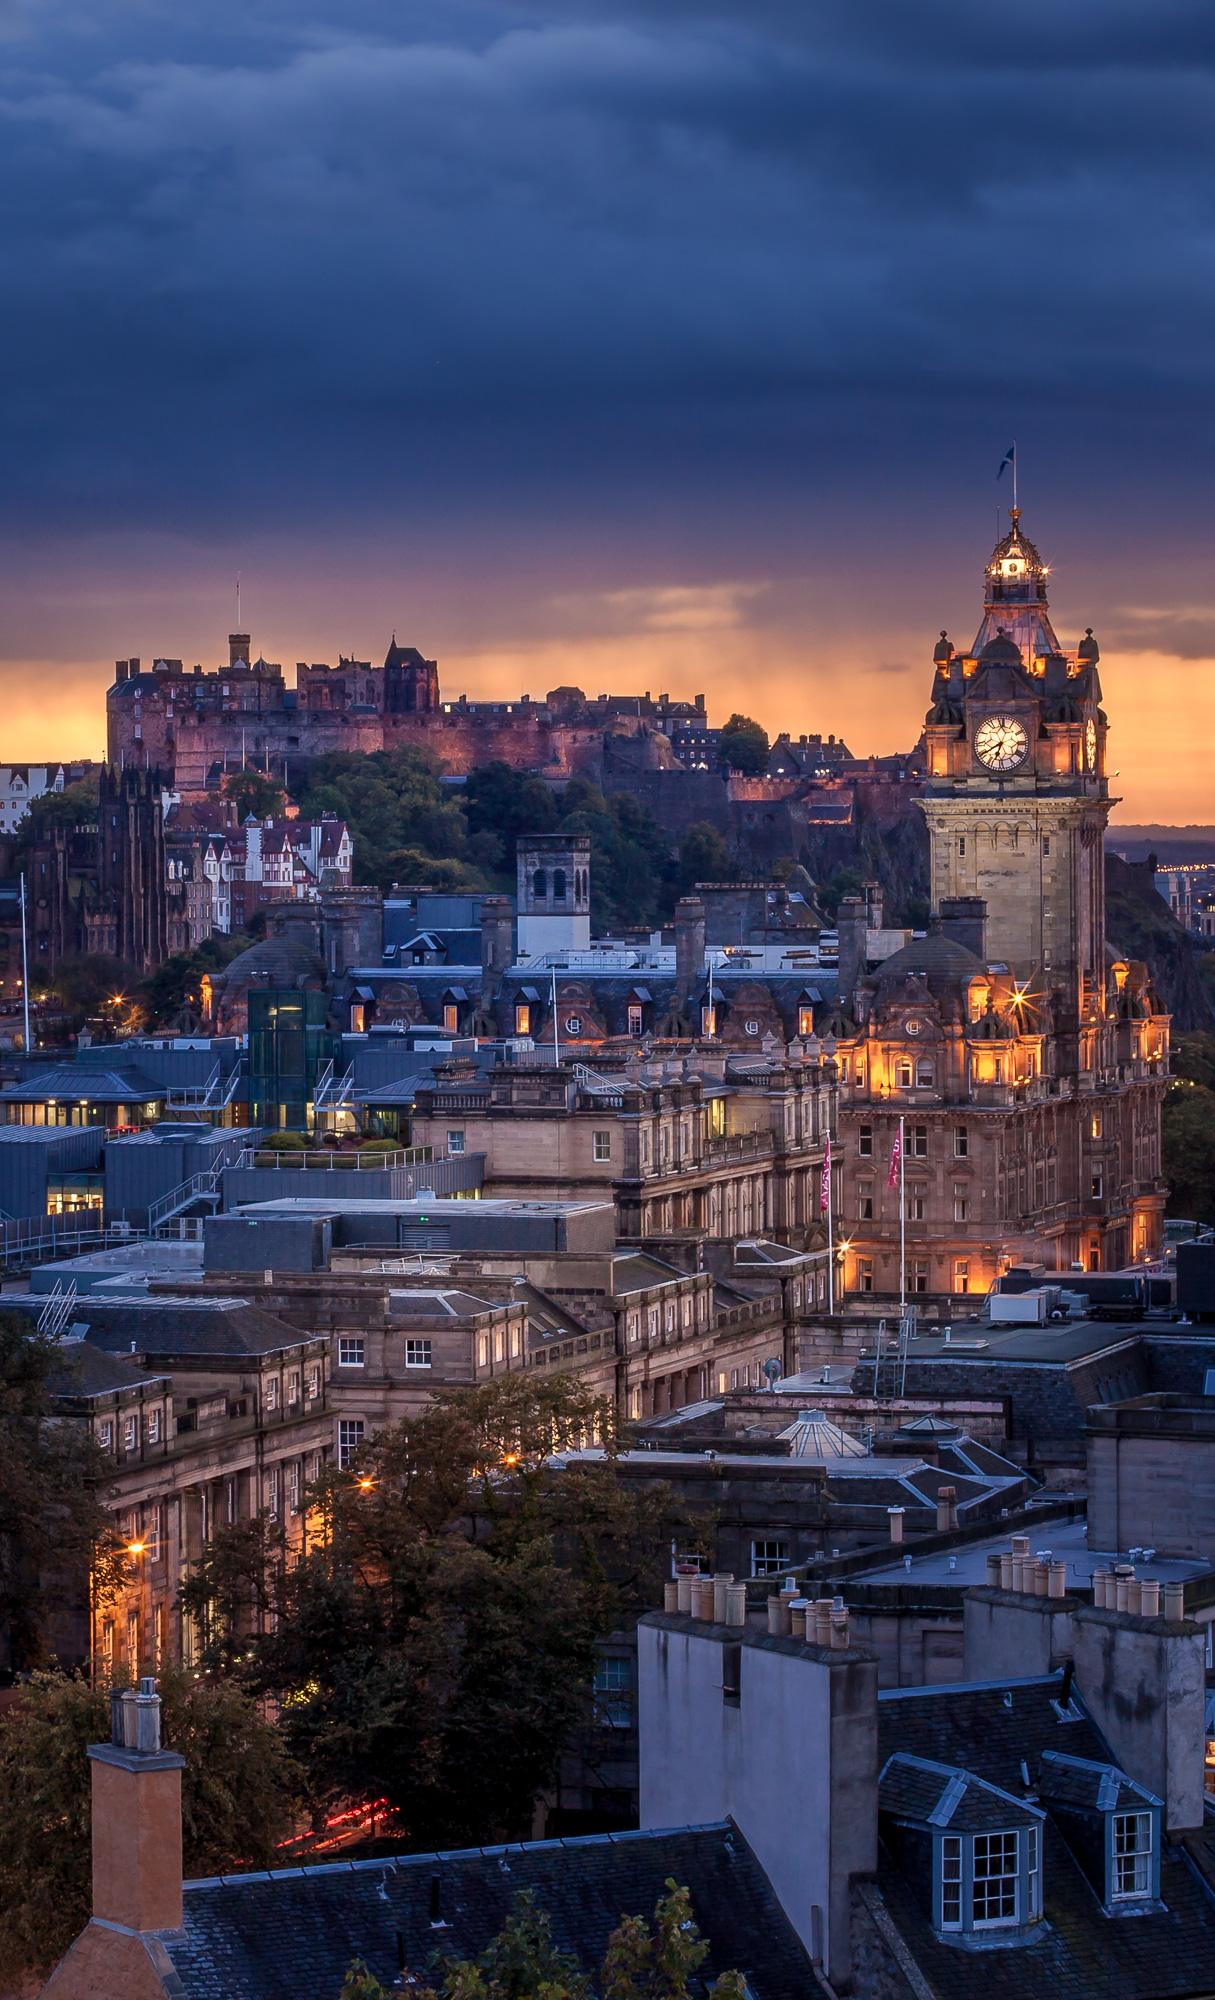 201510_Edinburgh_Stuart McMillan Photography_016.jpg